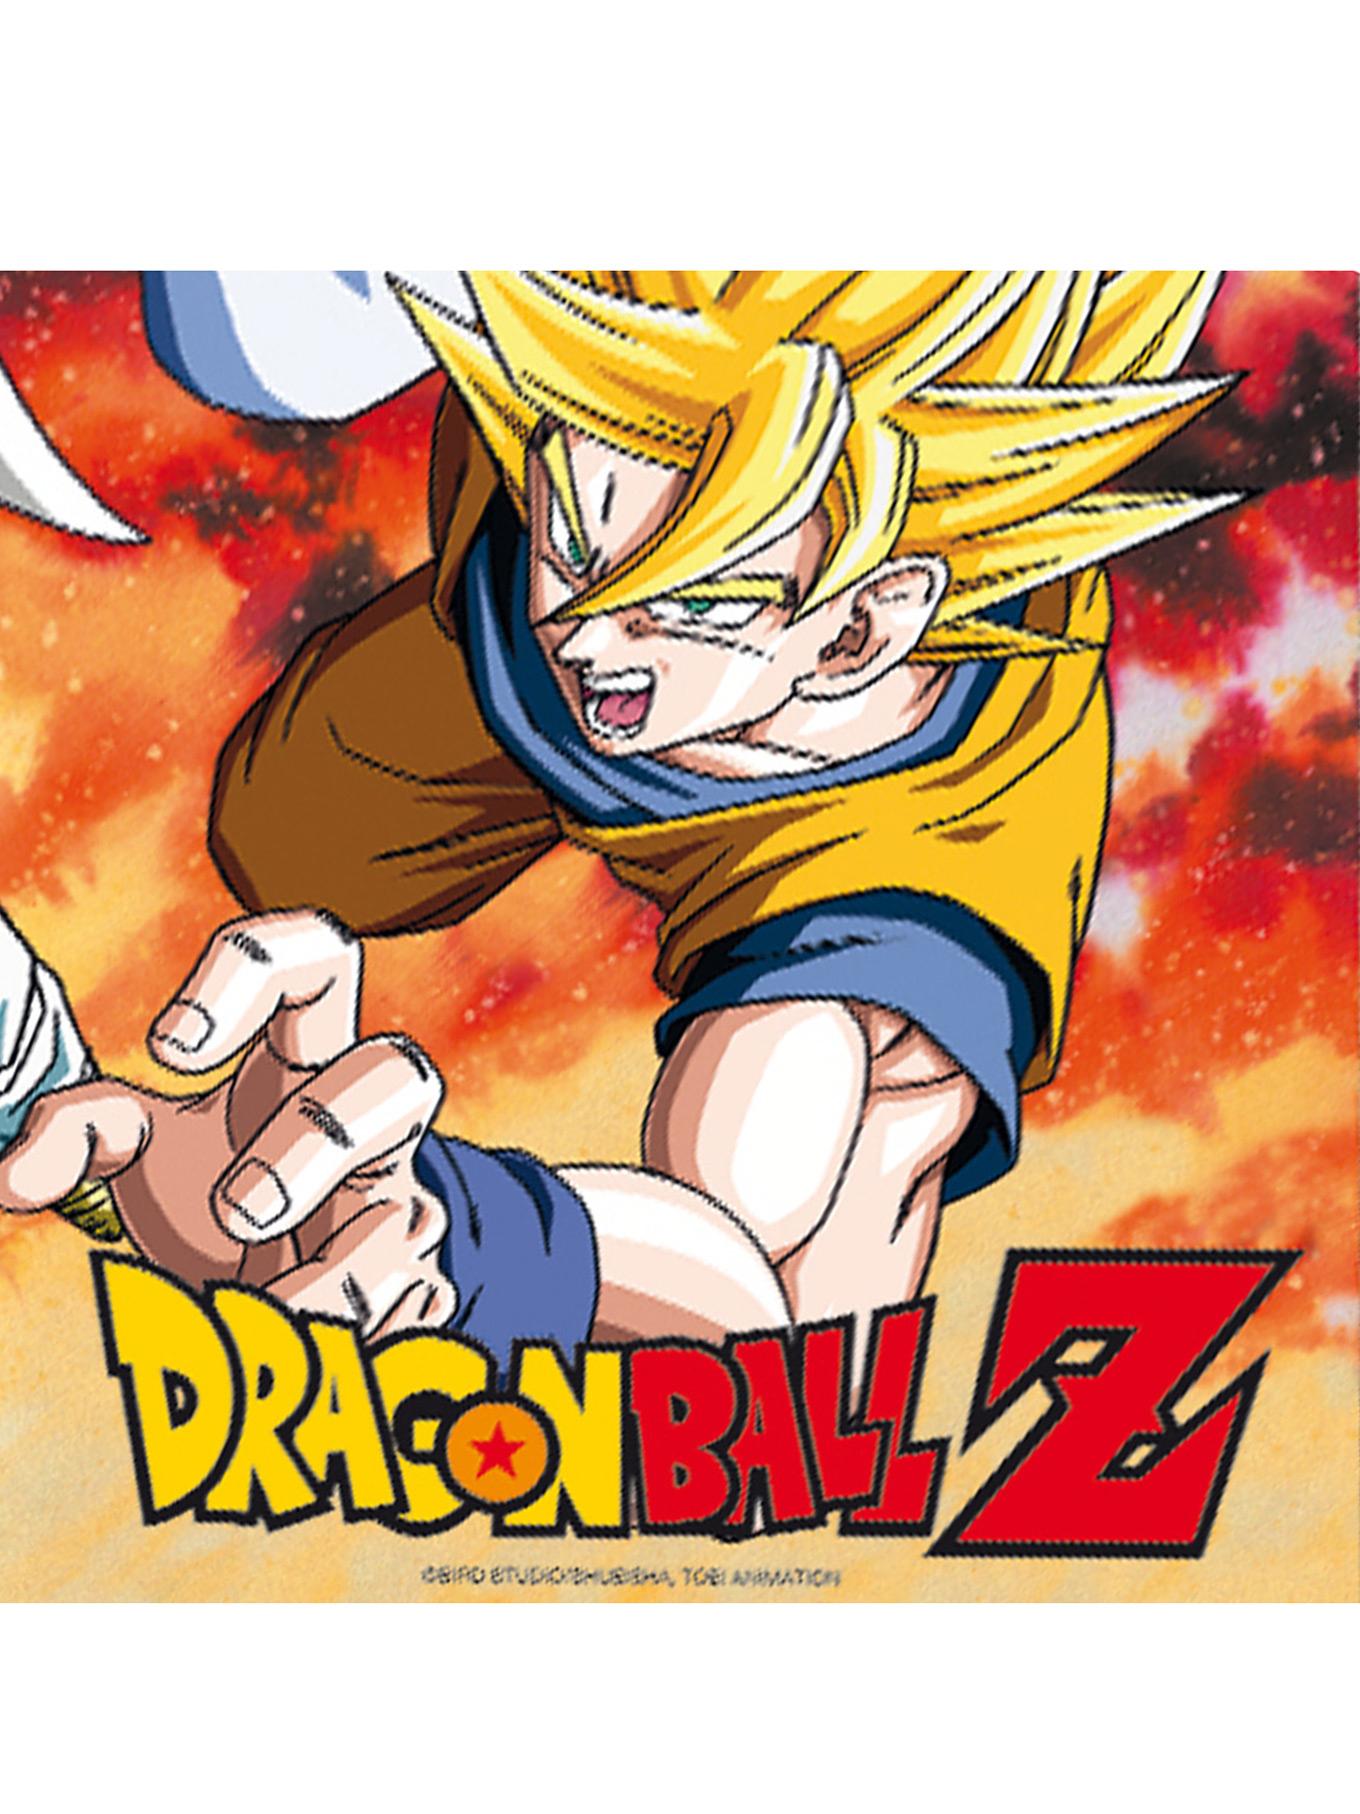 20 Serviettes En Papier Dragon Ball Z™ 33 X 33 Cm à Dessin Animé De Dragon Ball Z